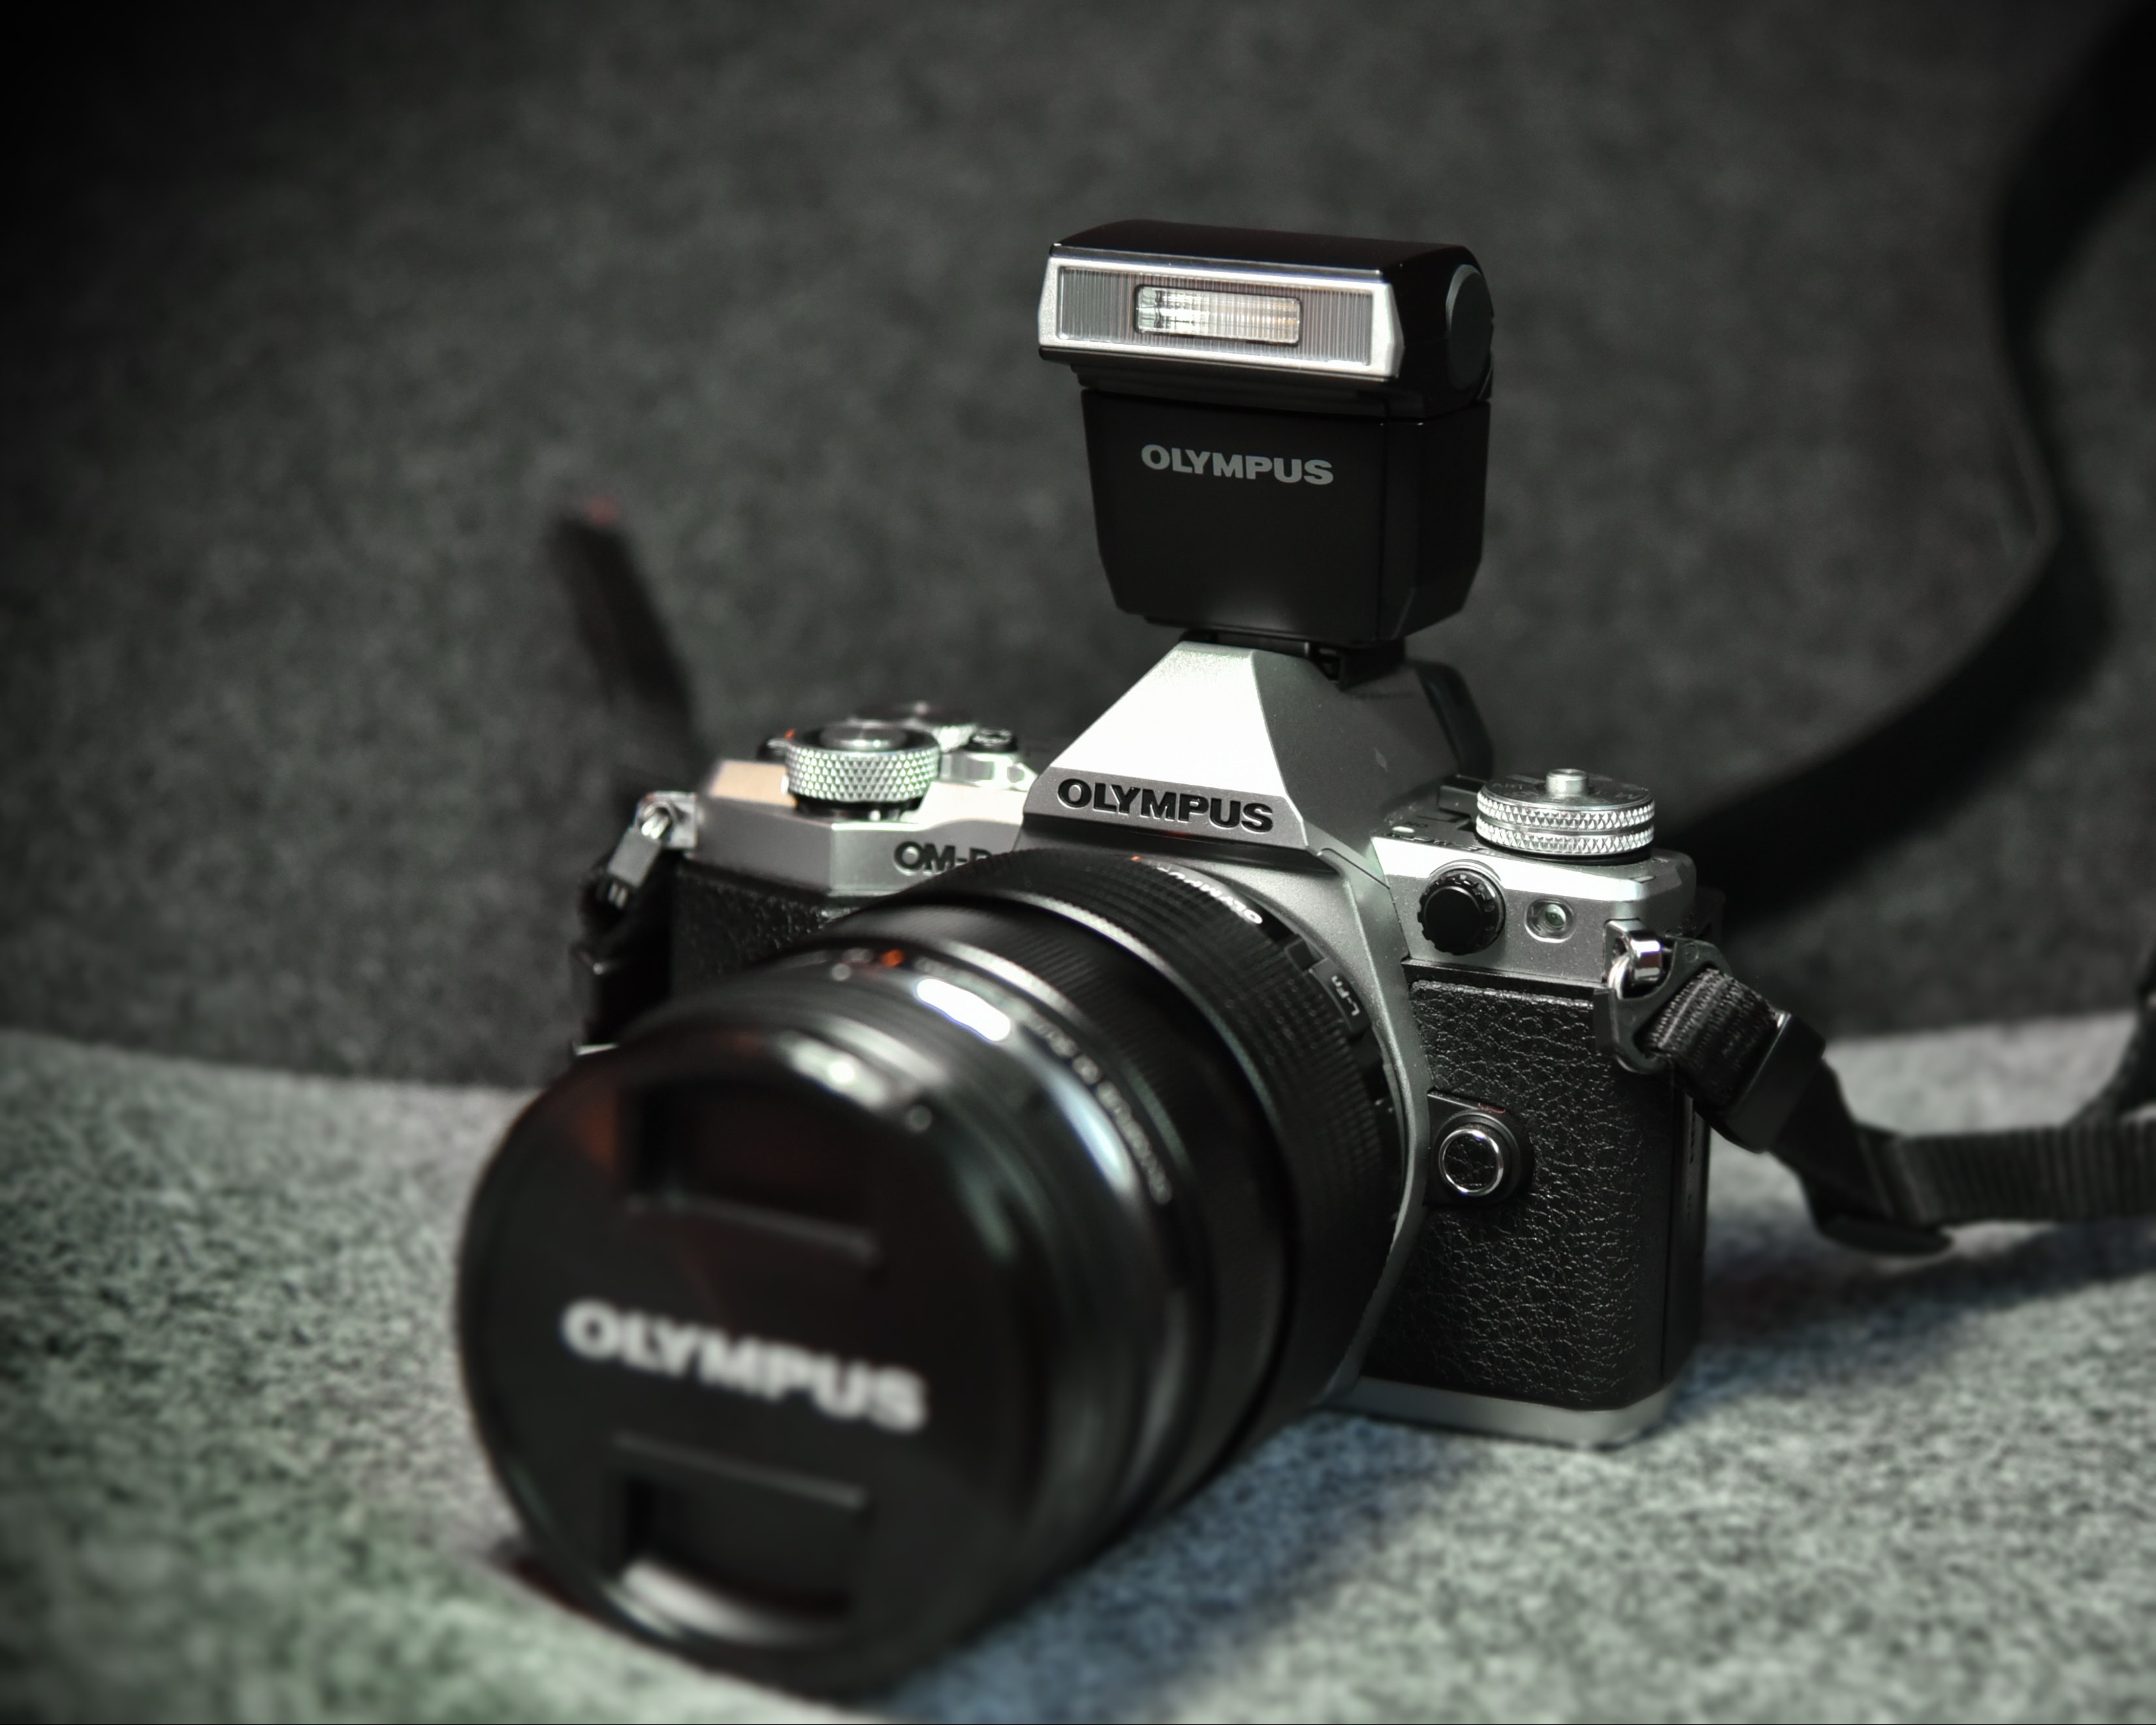 black and grey Olympus camera